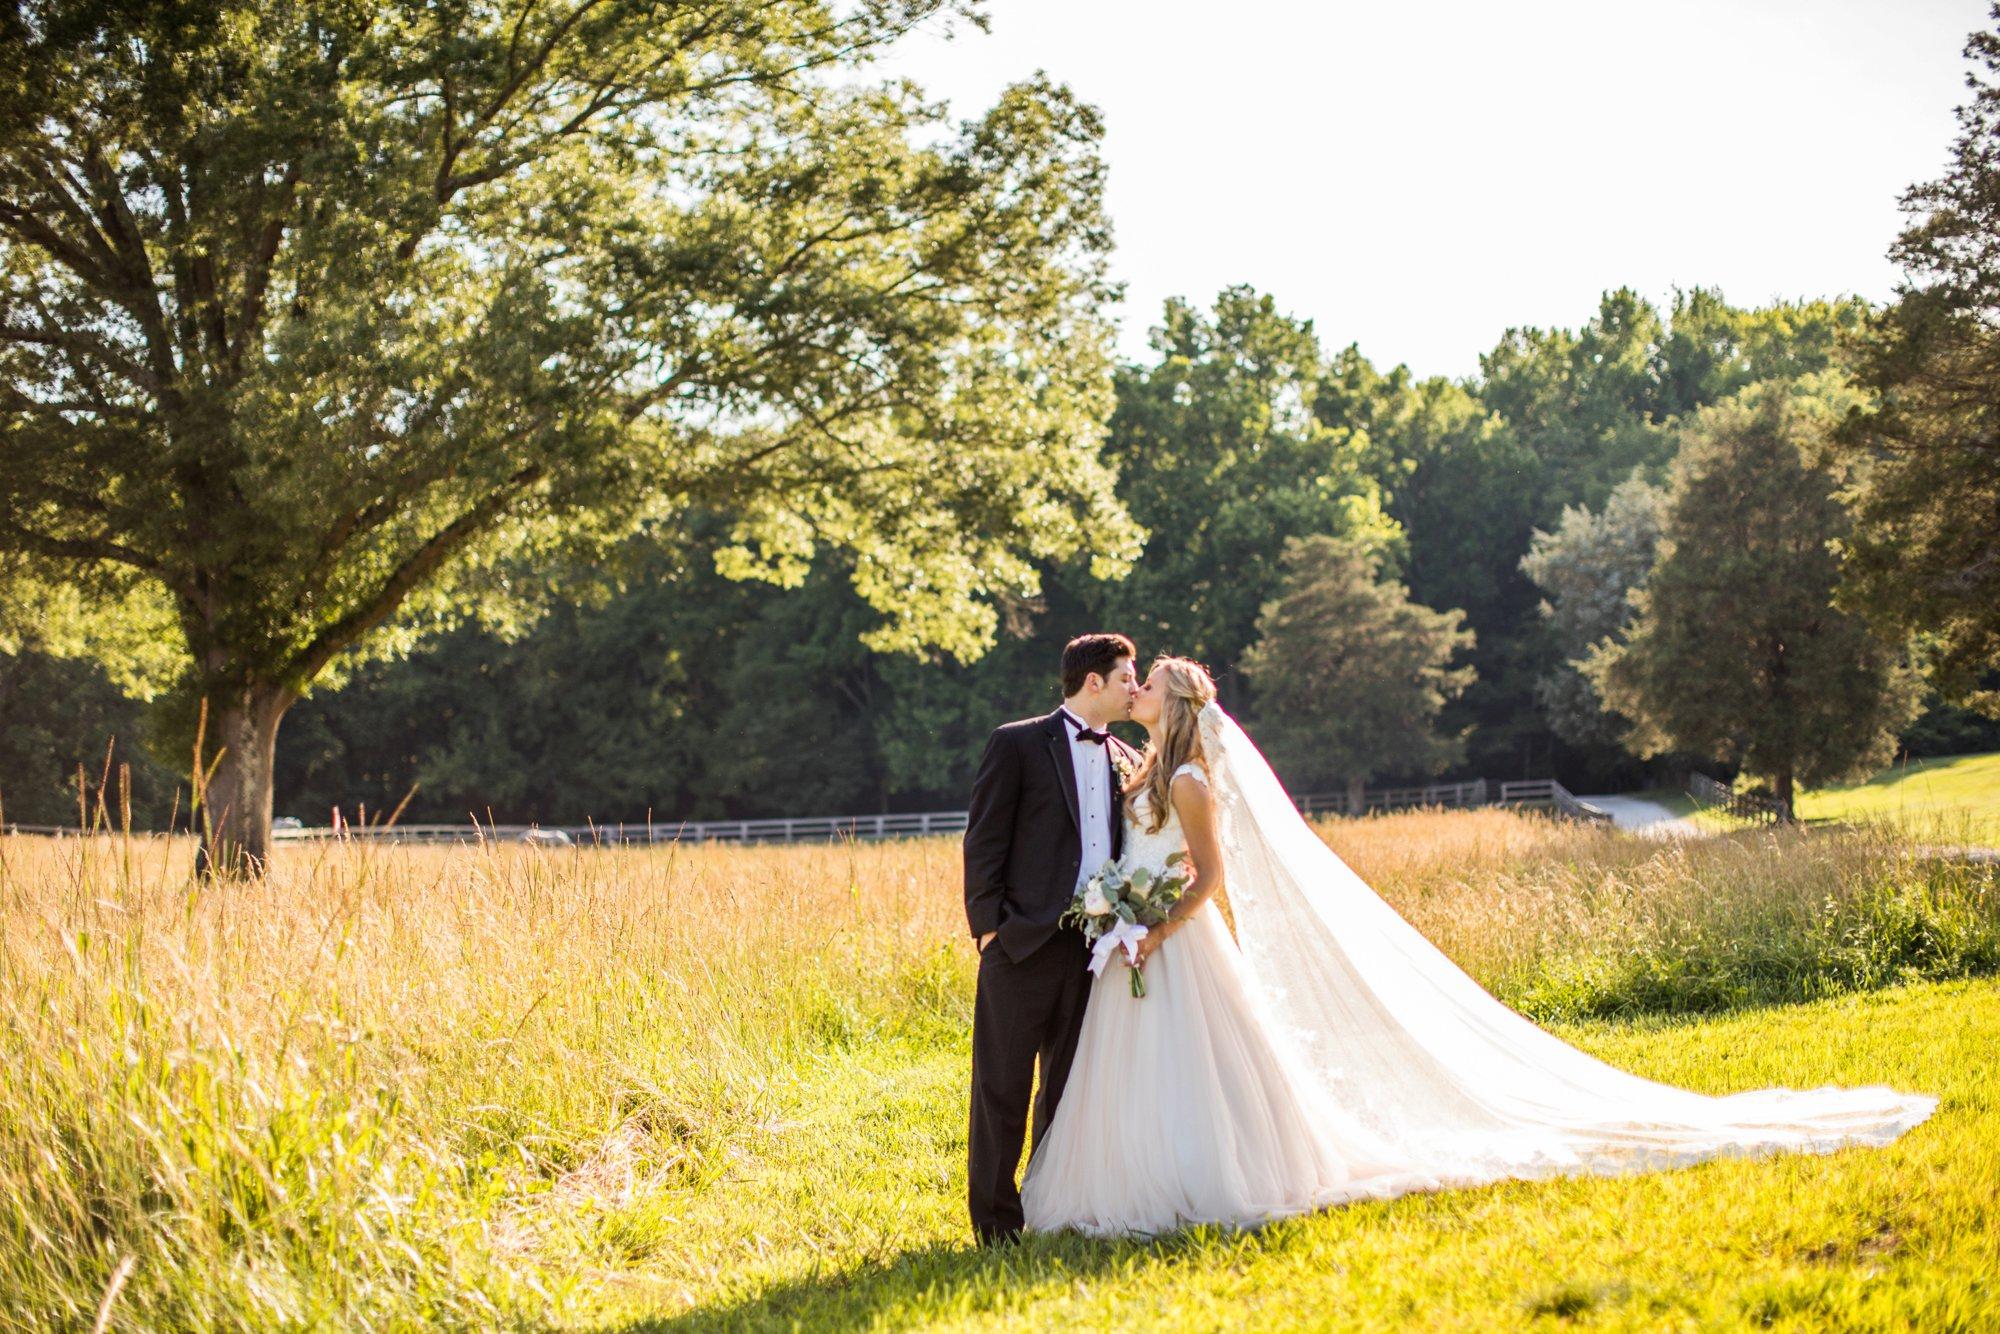 wedding-photography-88-love-stories_0031.jpg